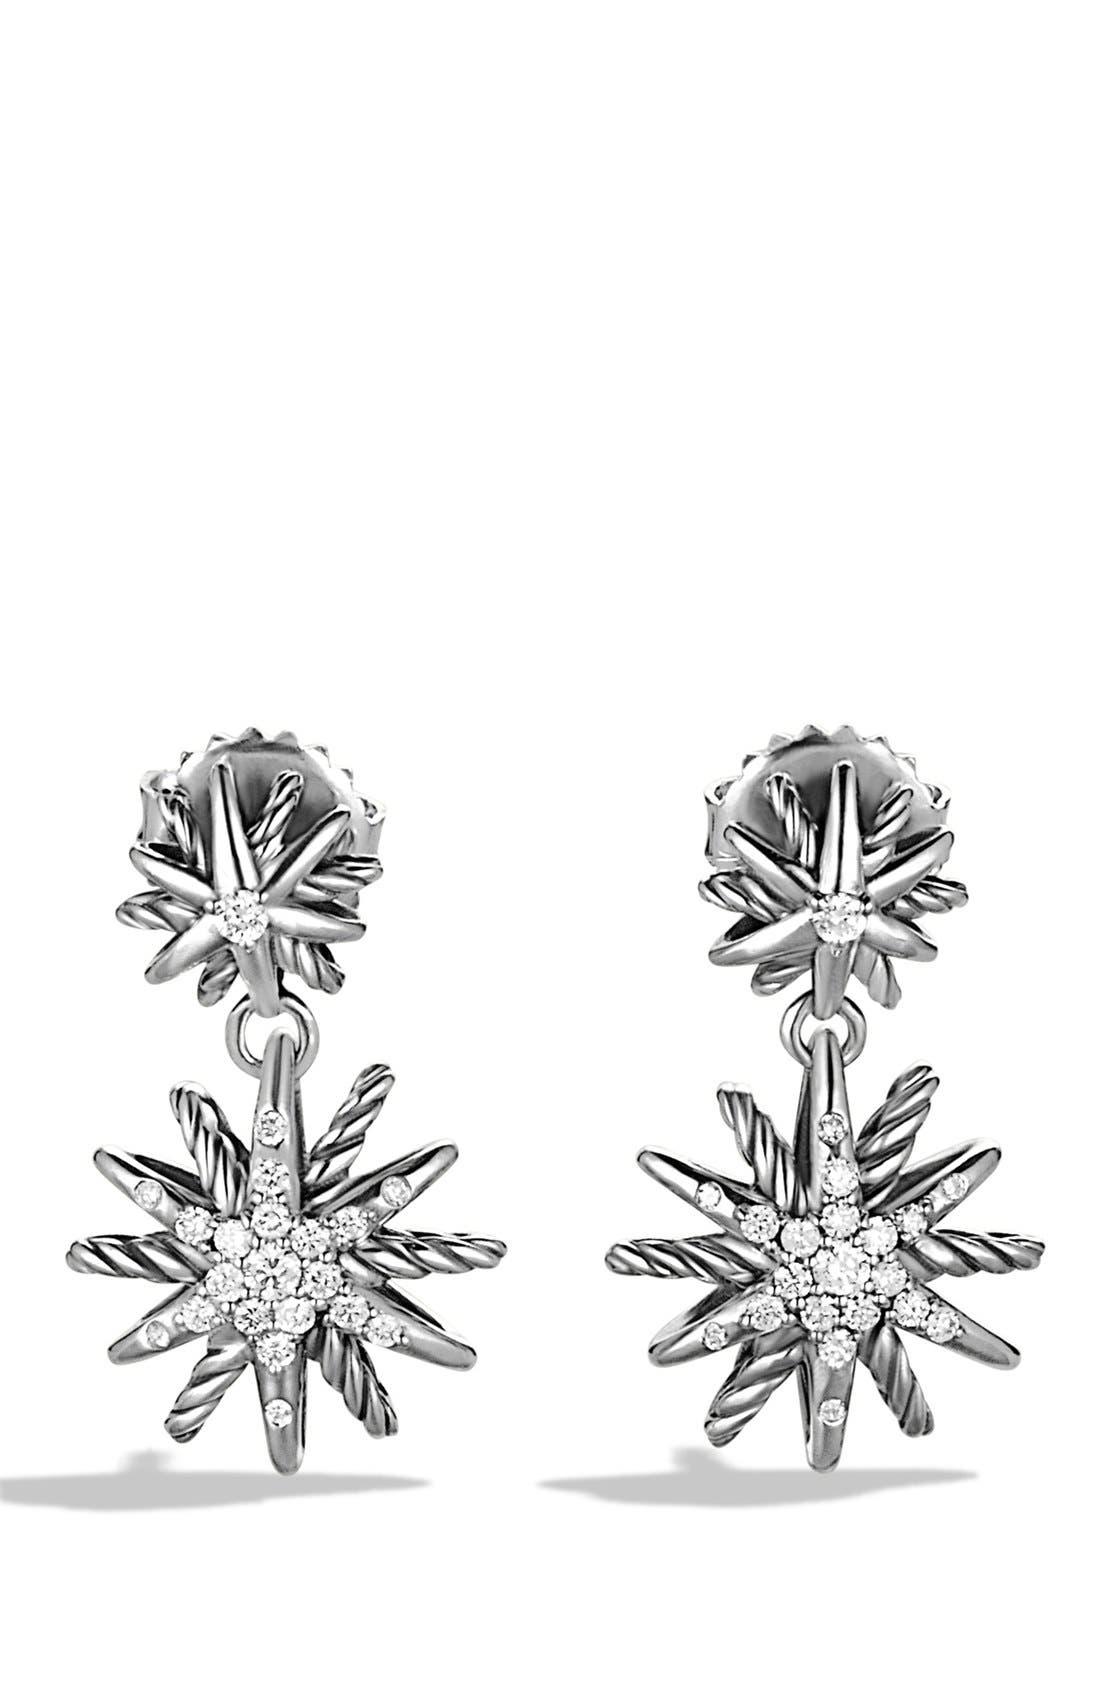 'Starburst' Double-Drop Earrings with Diamonds,                         Main,                         color, Diamond